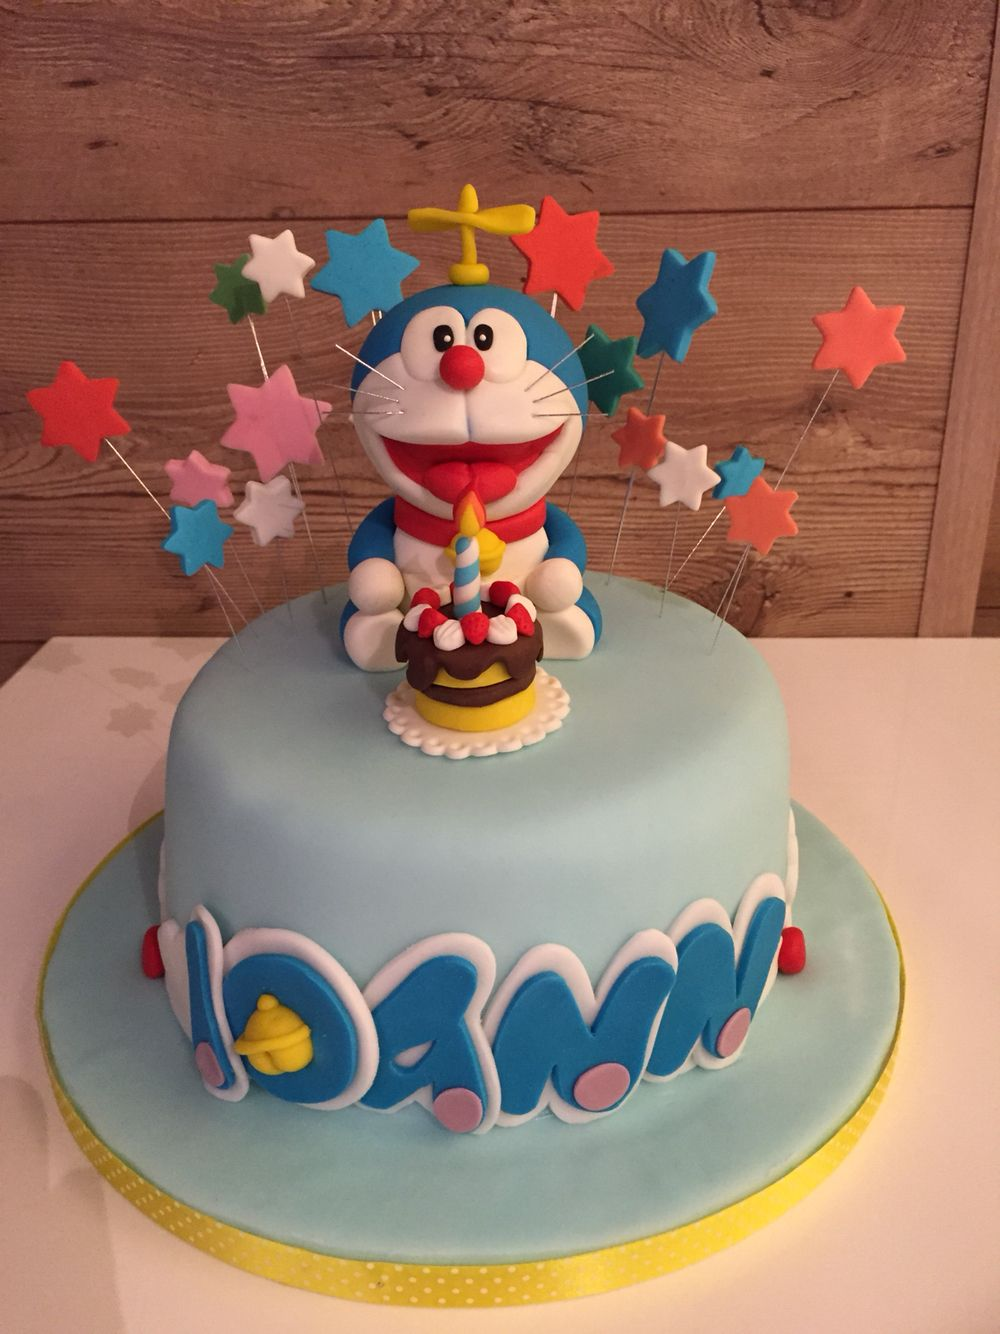 Doraemon | Doraemon cake, Fondant cakes